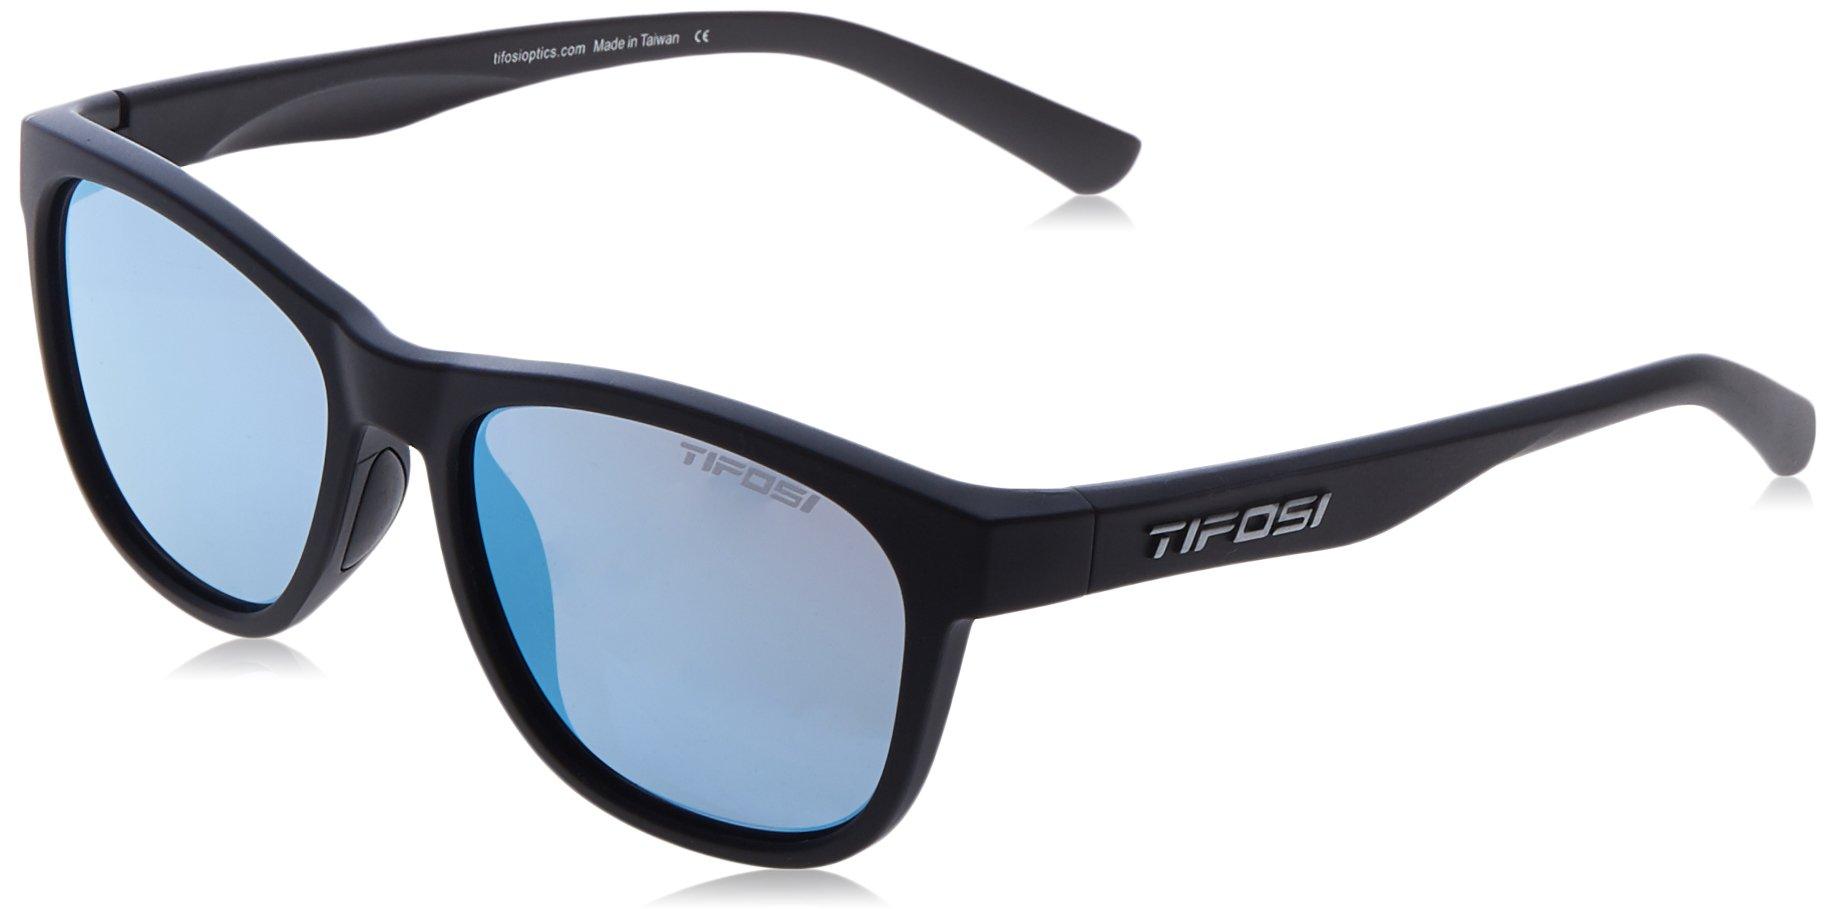 Tifosi Swank Sunglasses, Satin Black